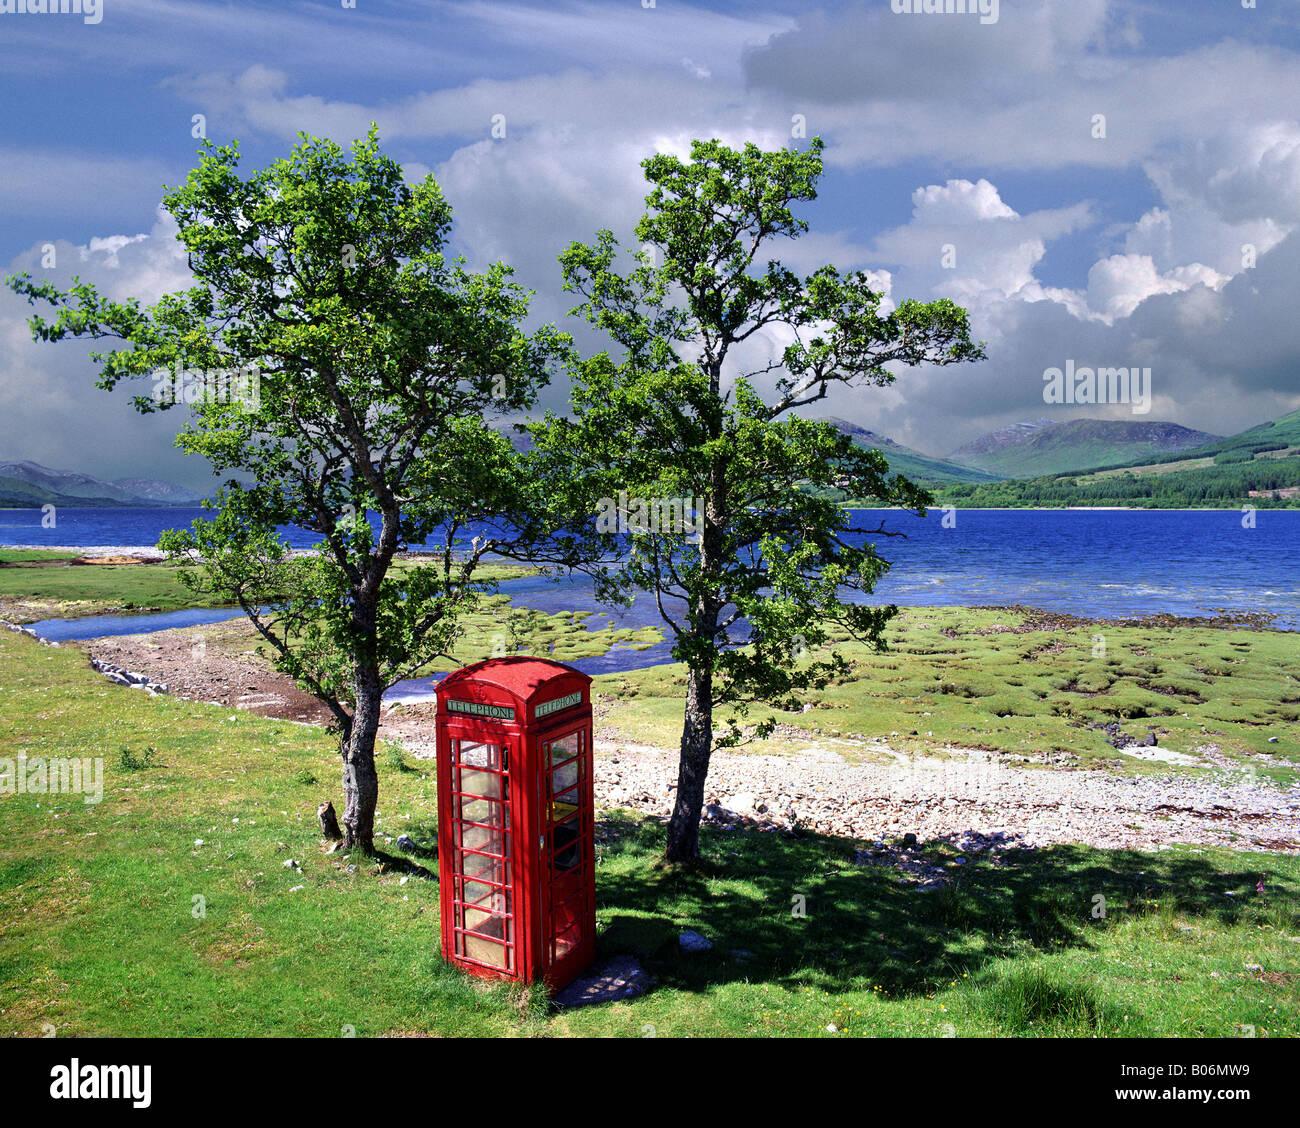 GB - SCOTLAND: Lone Telephone Box along Loch Eil - Stock Image